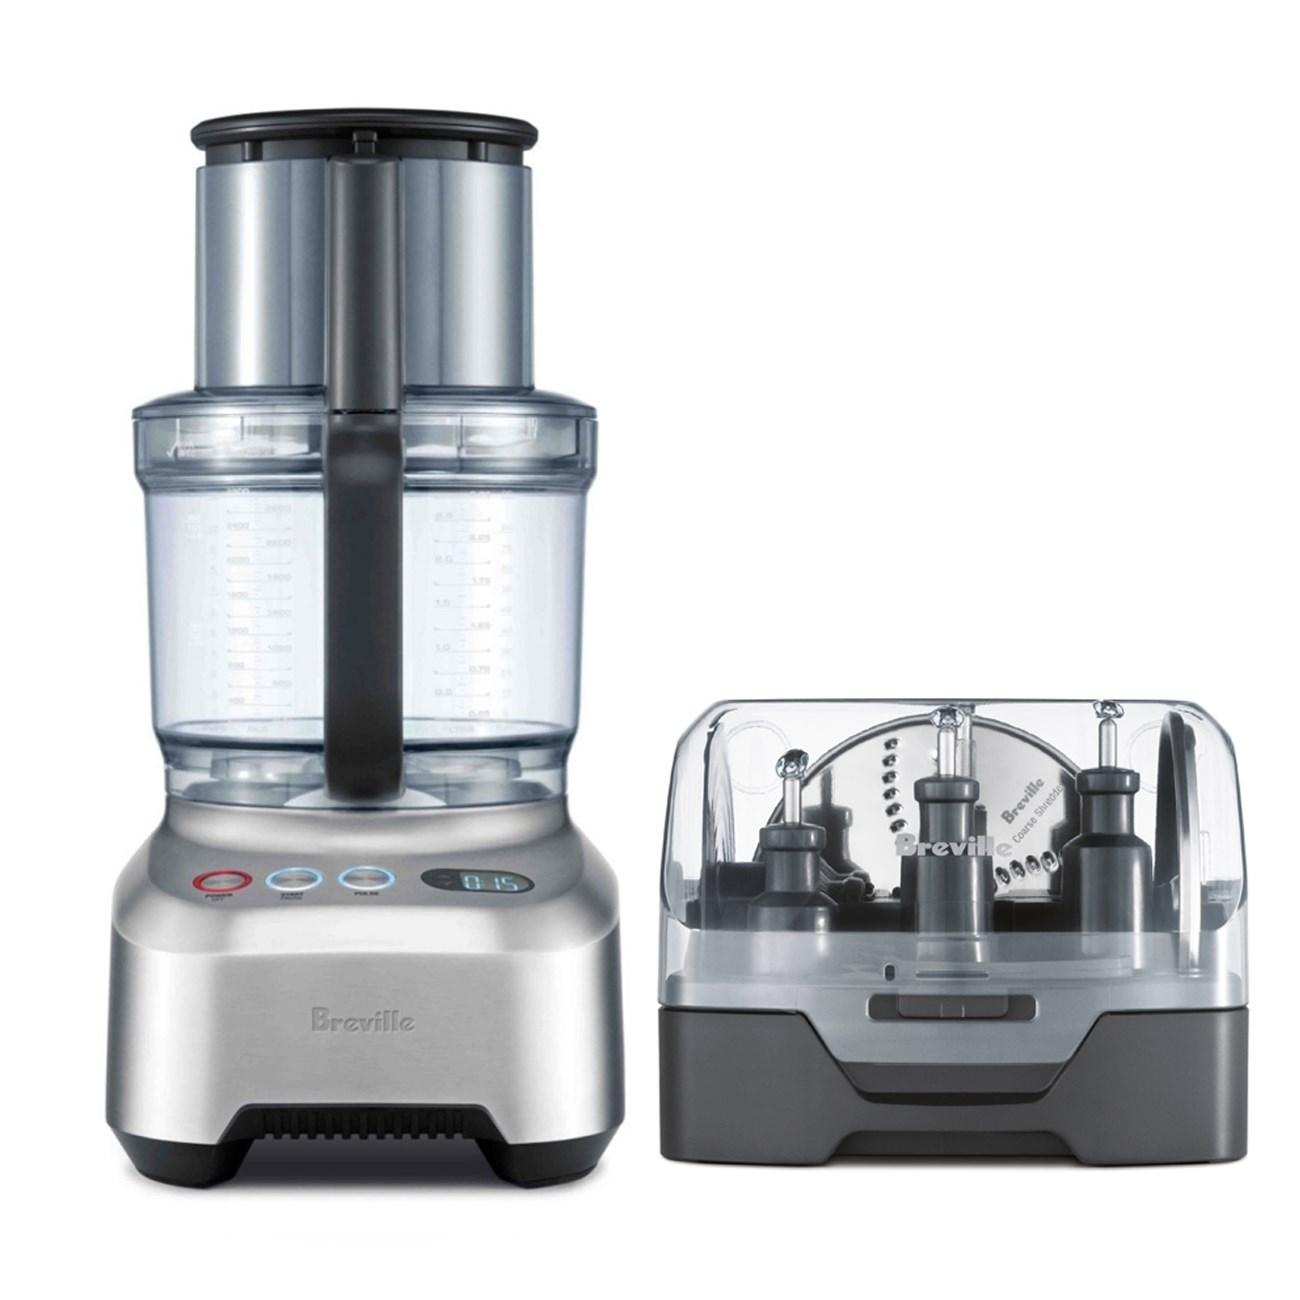 Breville Cake Mixer Parts Nz Reviewmotors Co